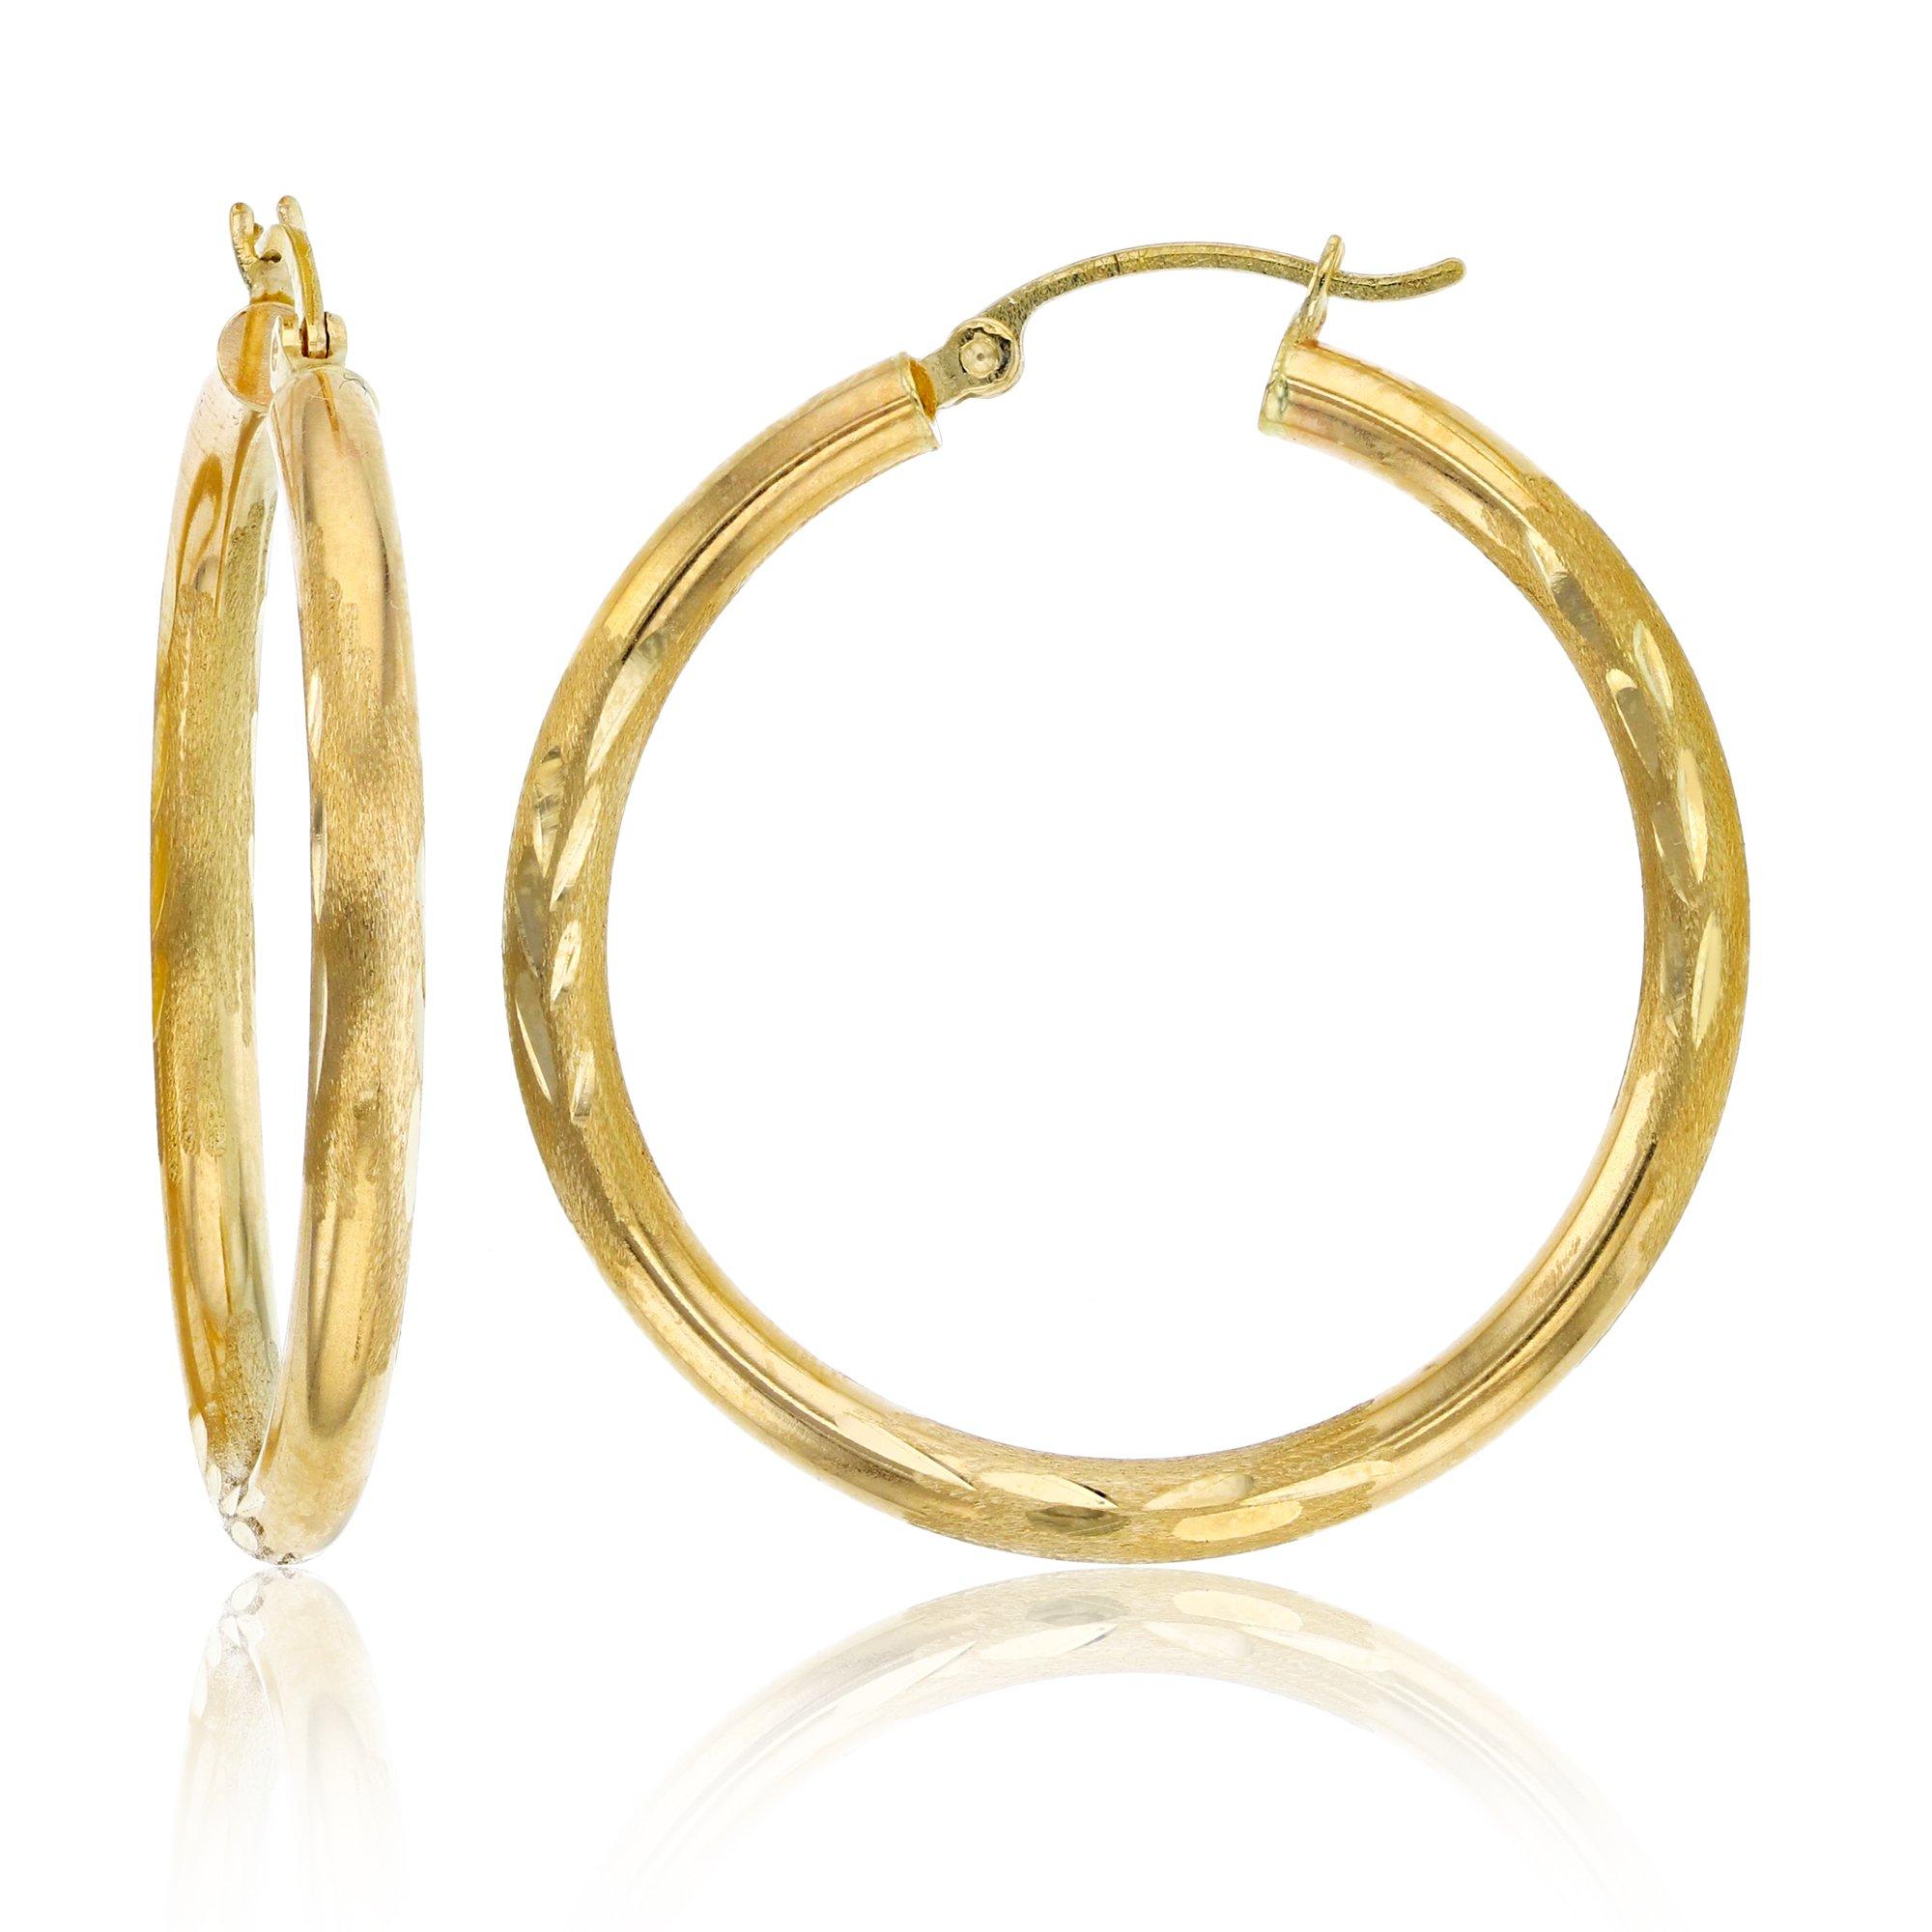 Decadence Women's 14k Yellow Gold 3X35mm DC Hoop Earrings